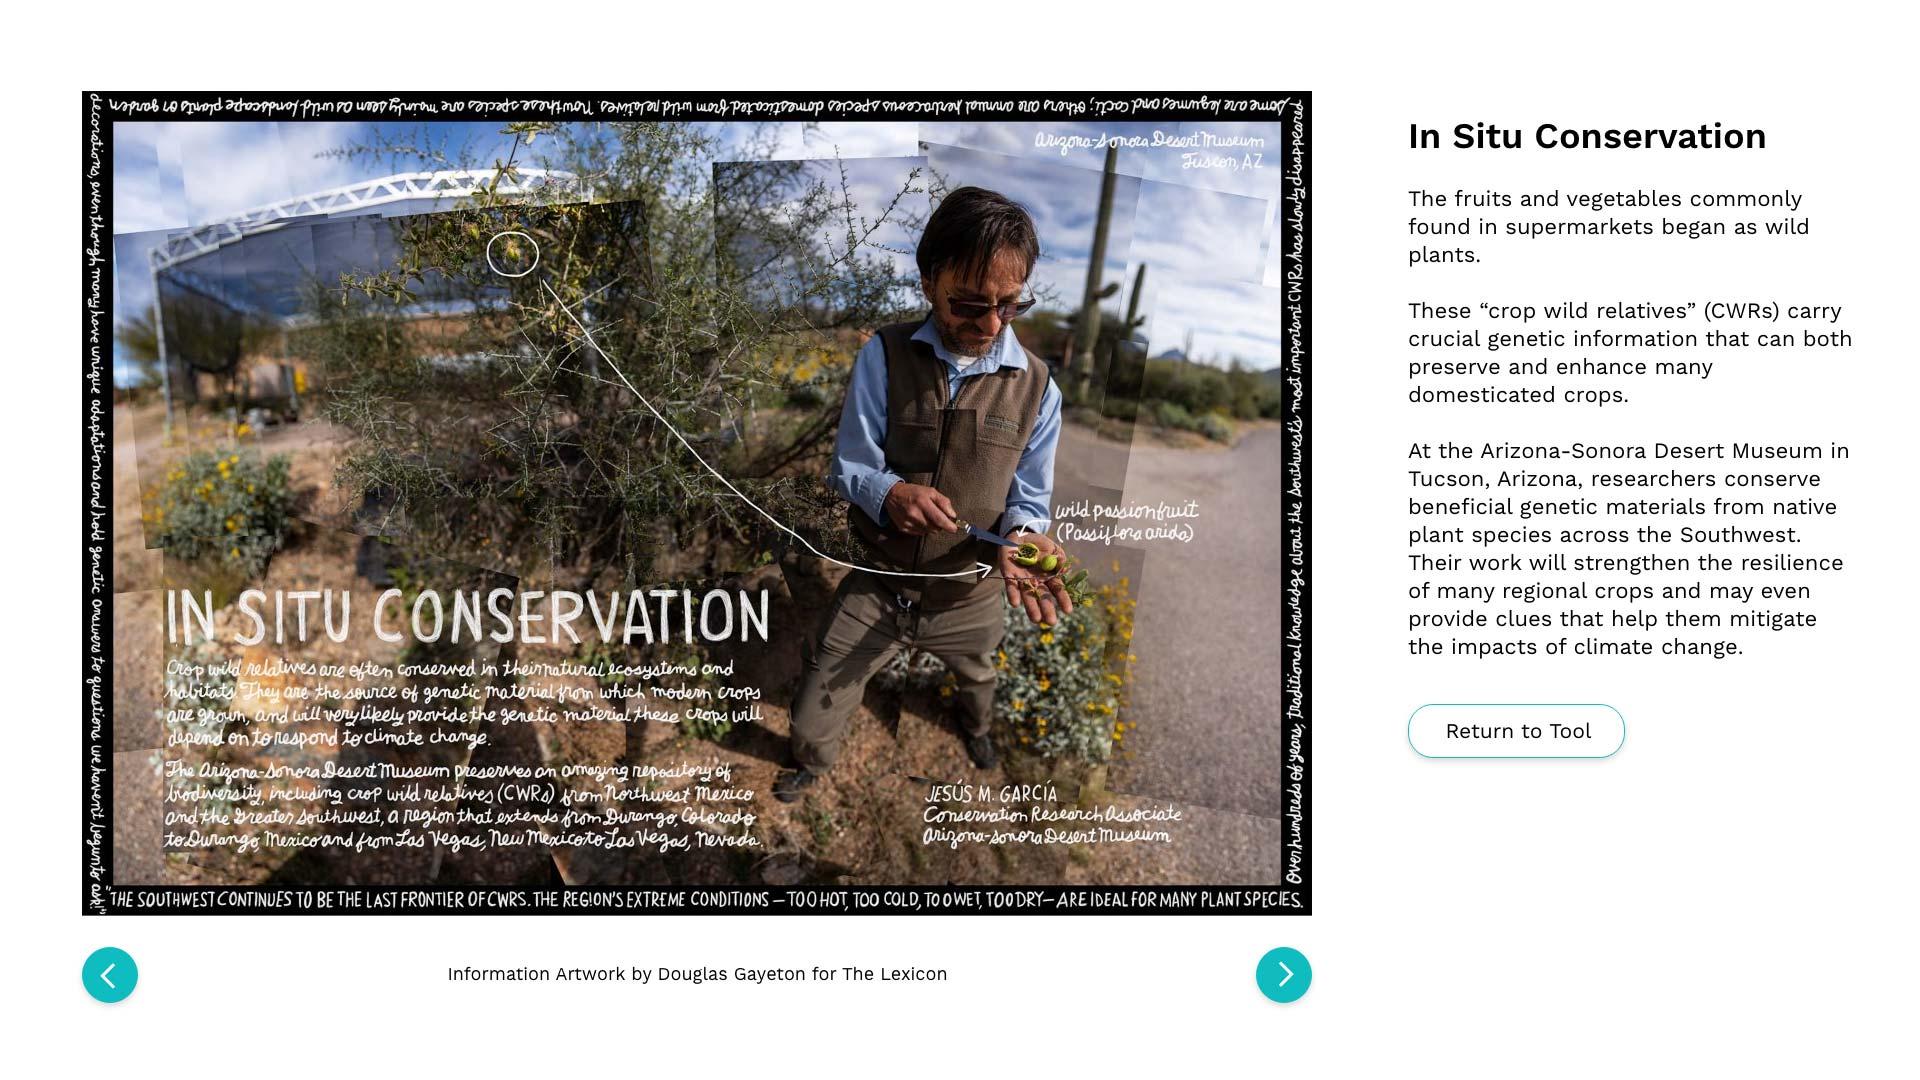 05b-In-Situ-Conservation-Artwork